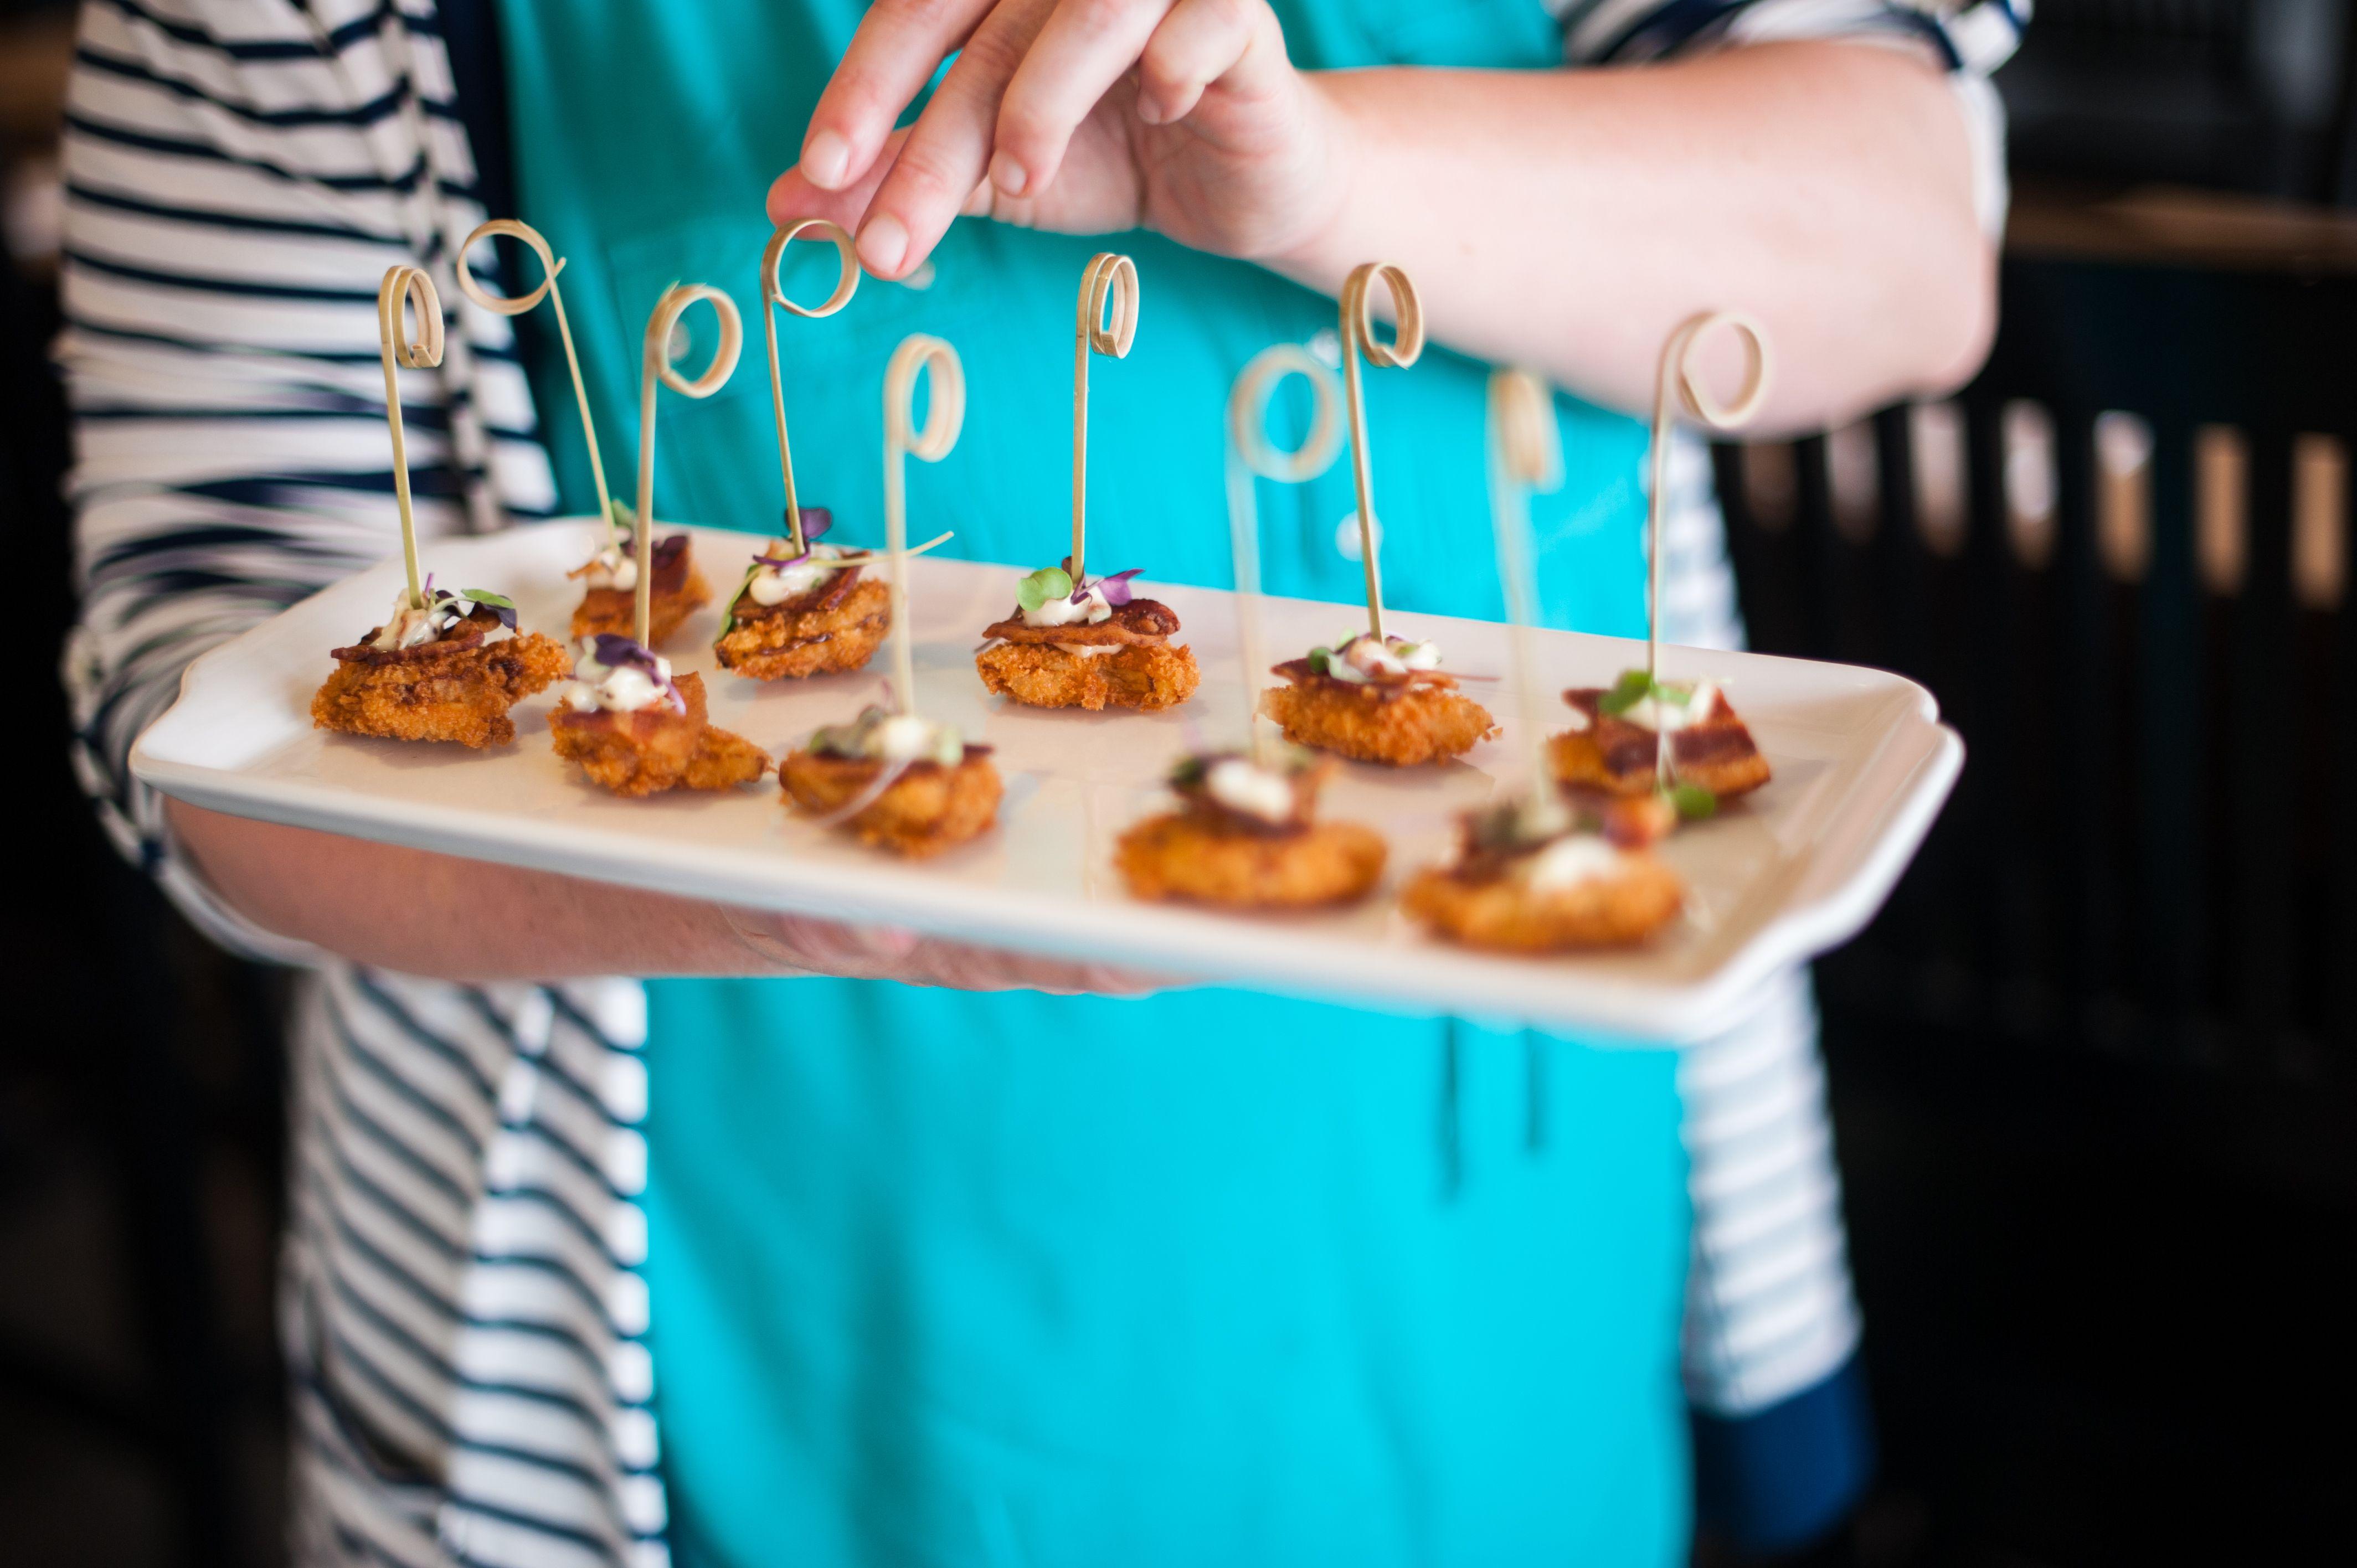 Caterer Katie Musser of 550 Events & Catering #Entrepreneur #Career #Caterer | Photography by Jennifer Prophet